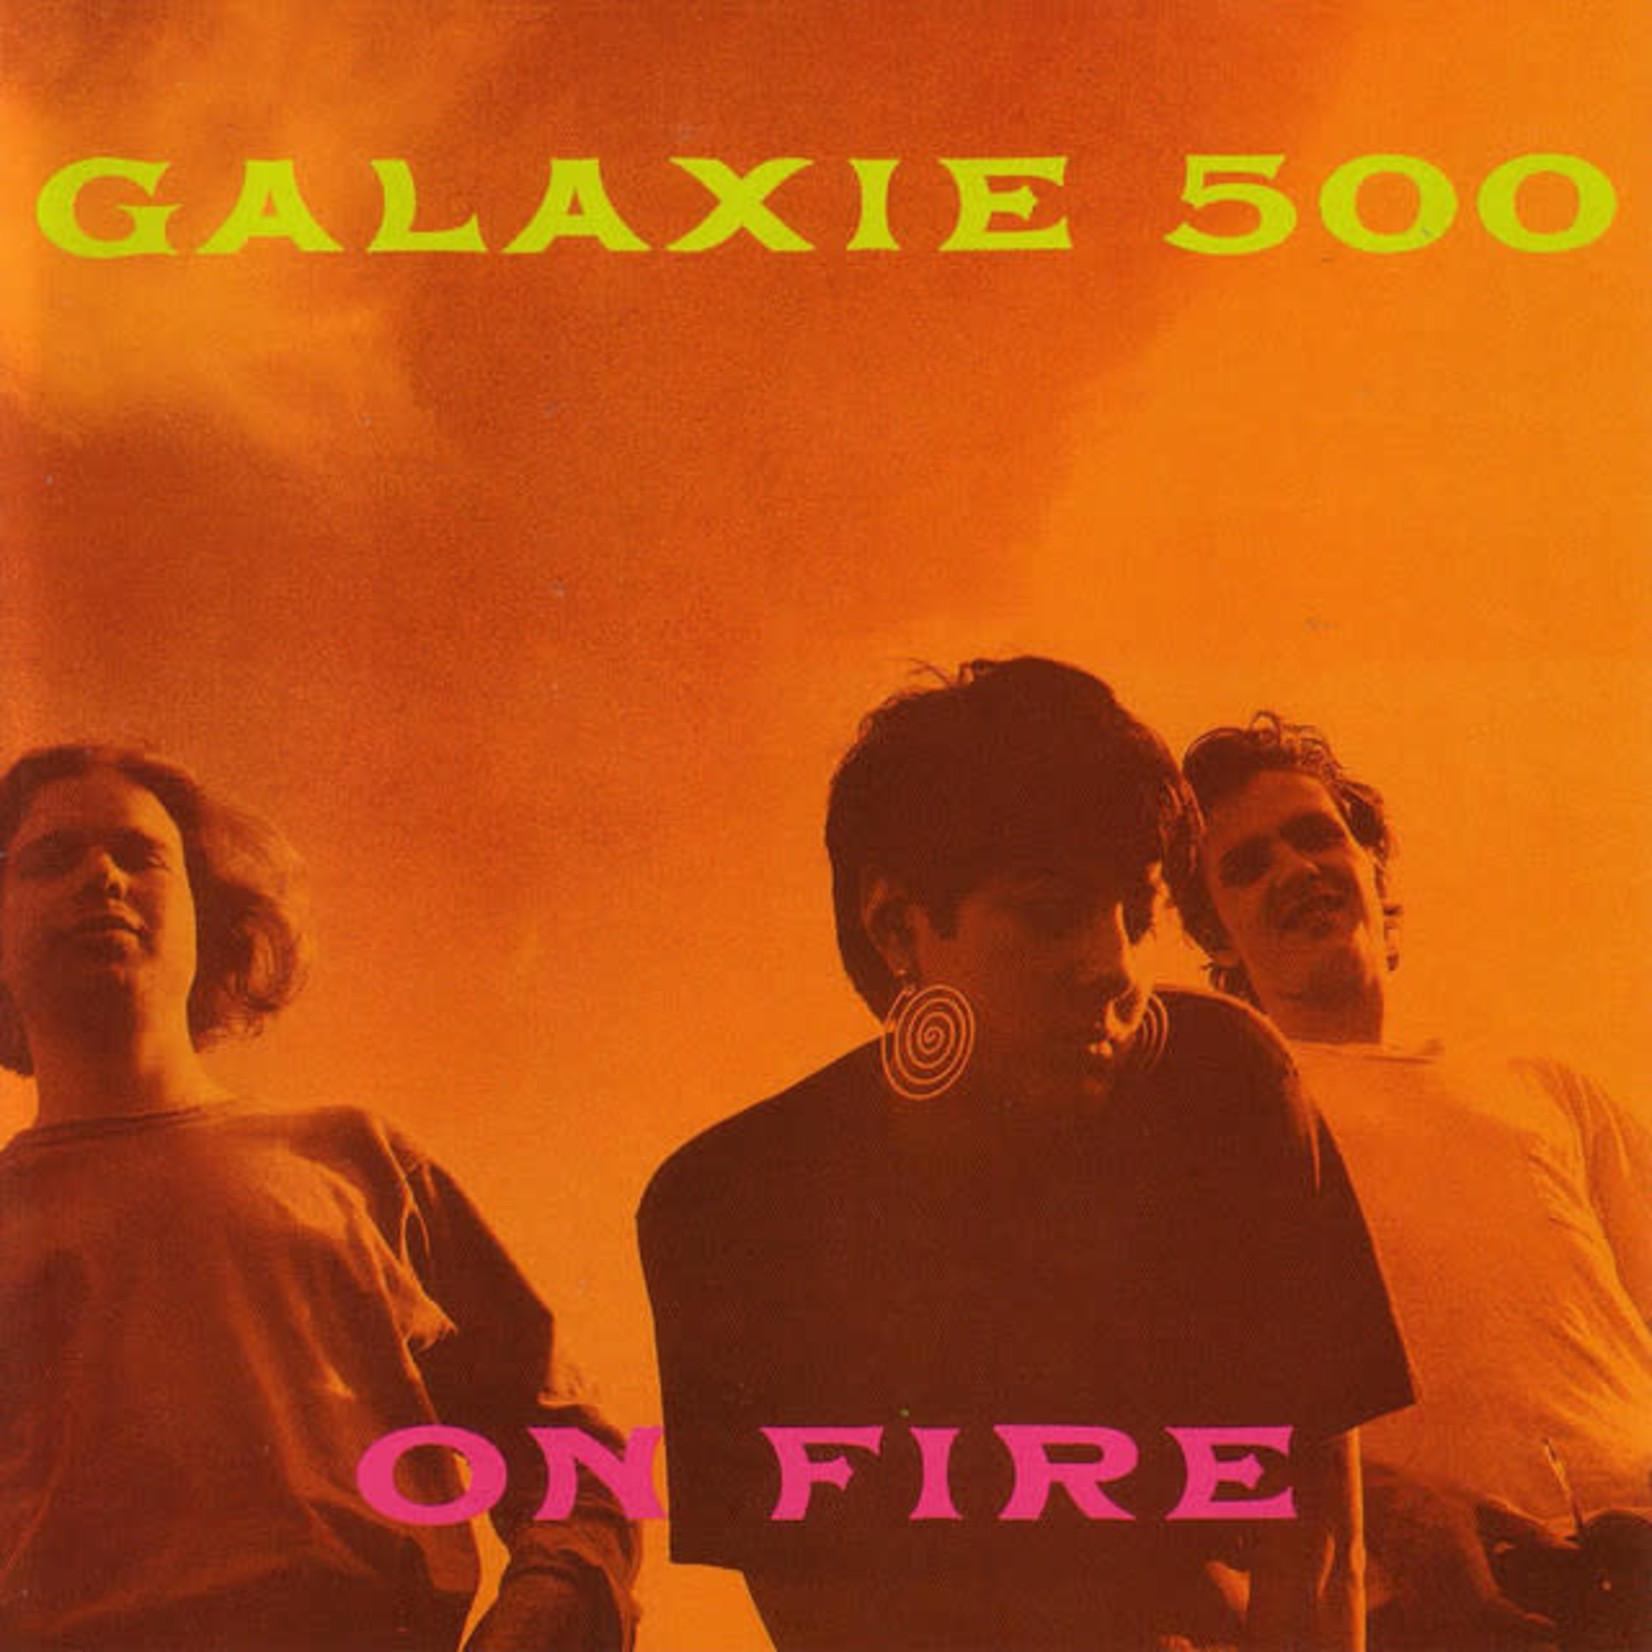 Vinyl Galaxie 500 - On Fire